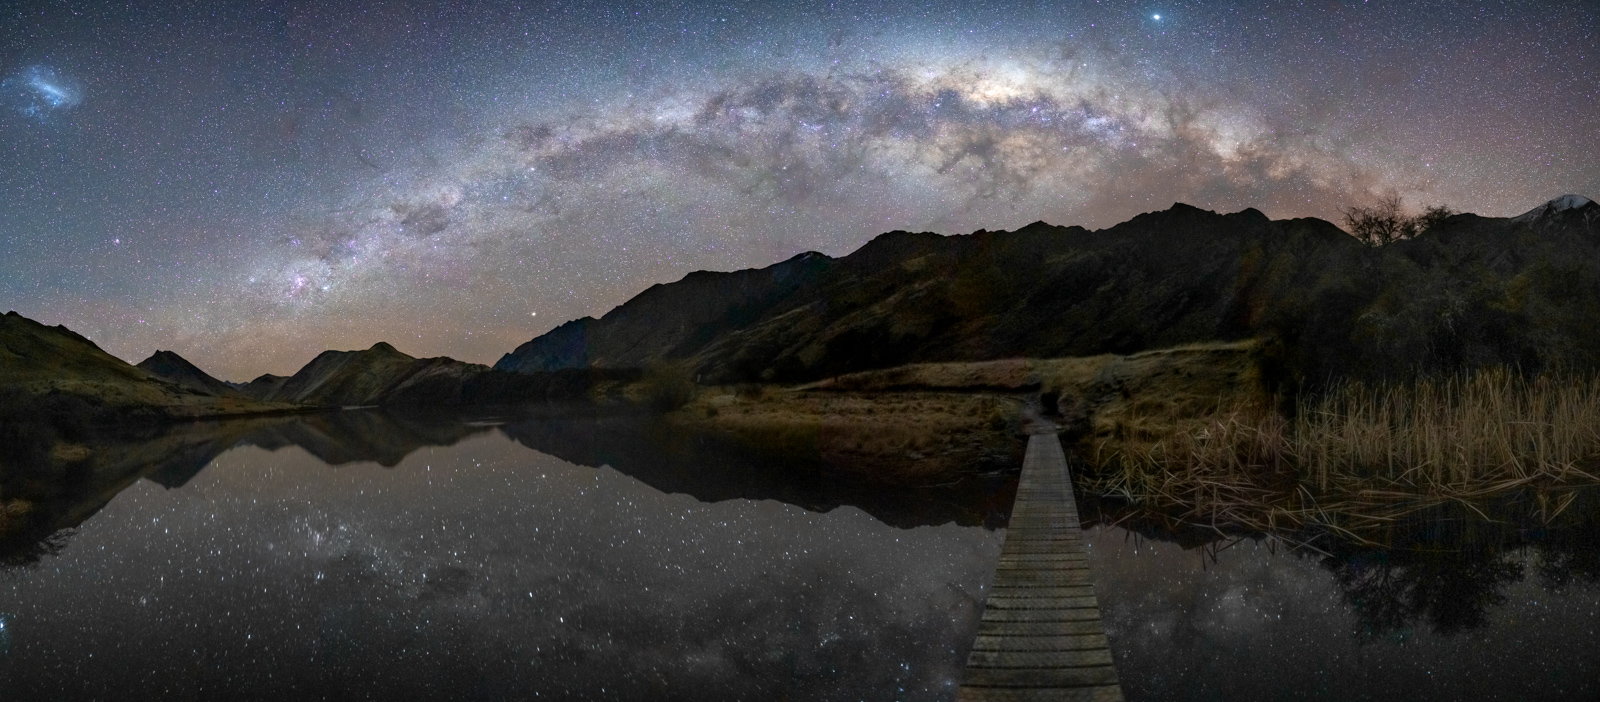 Moke Lake Astro Panorama